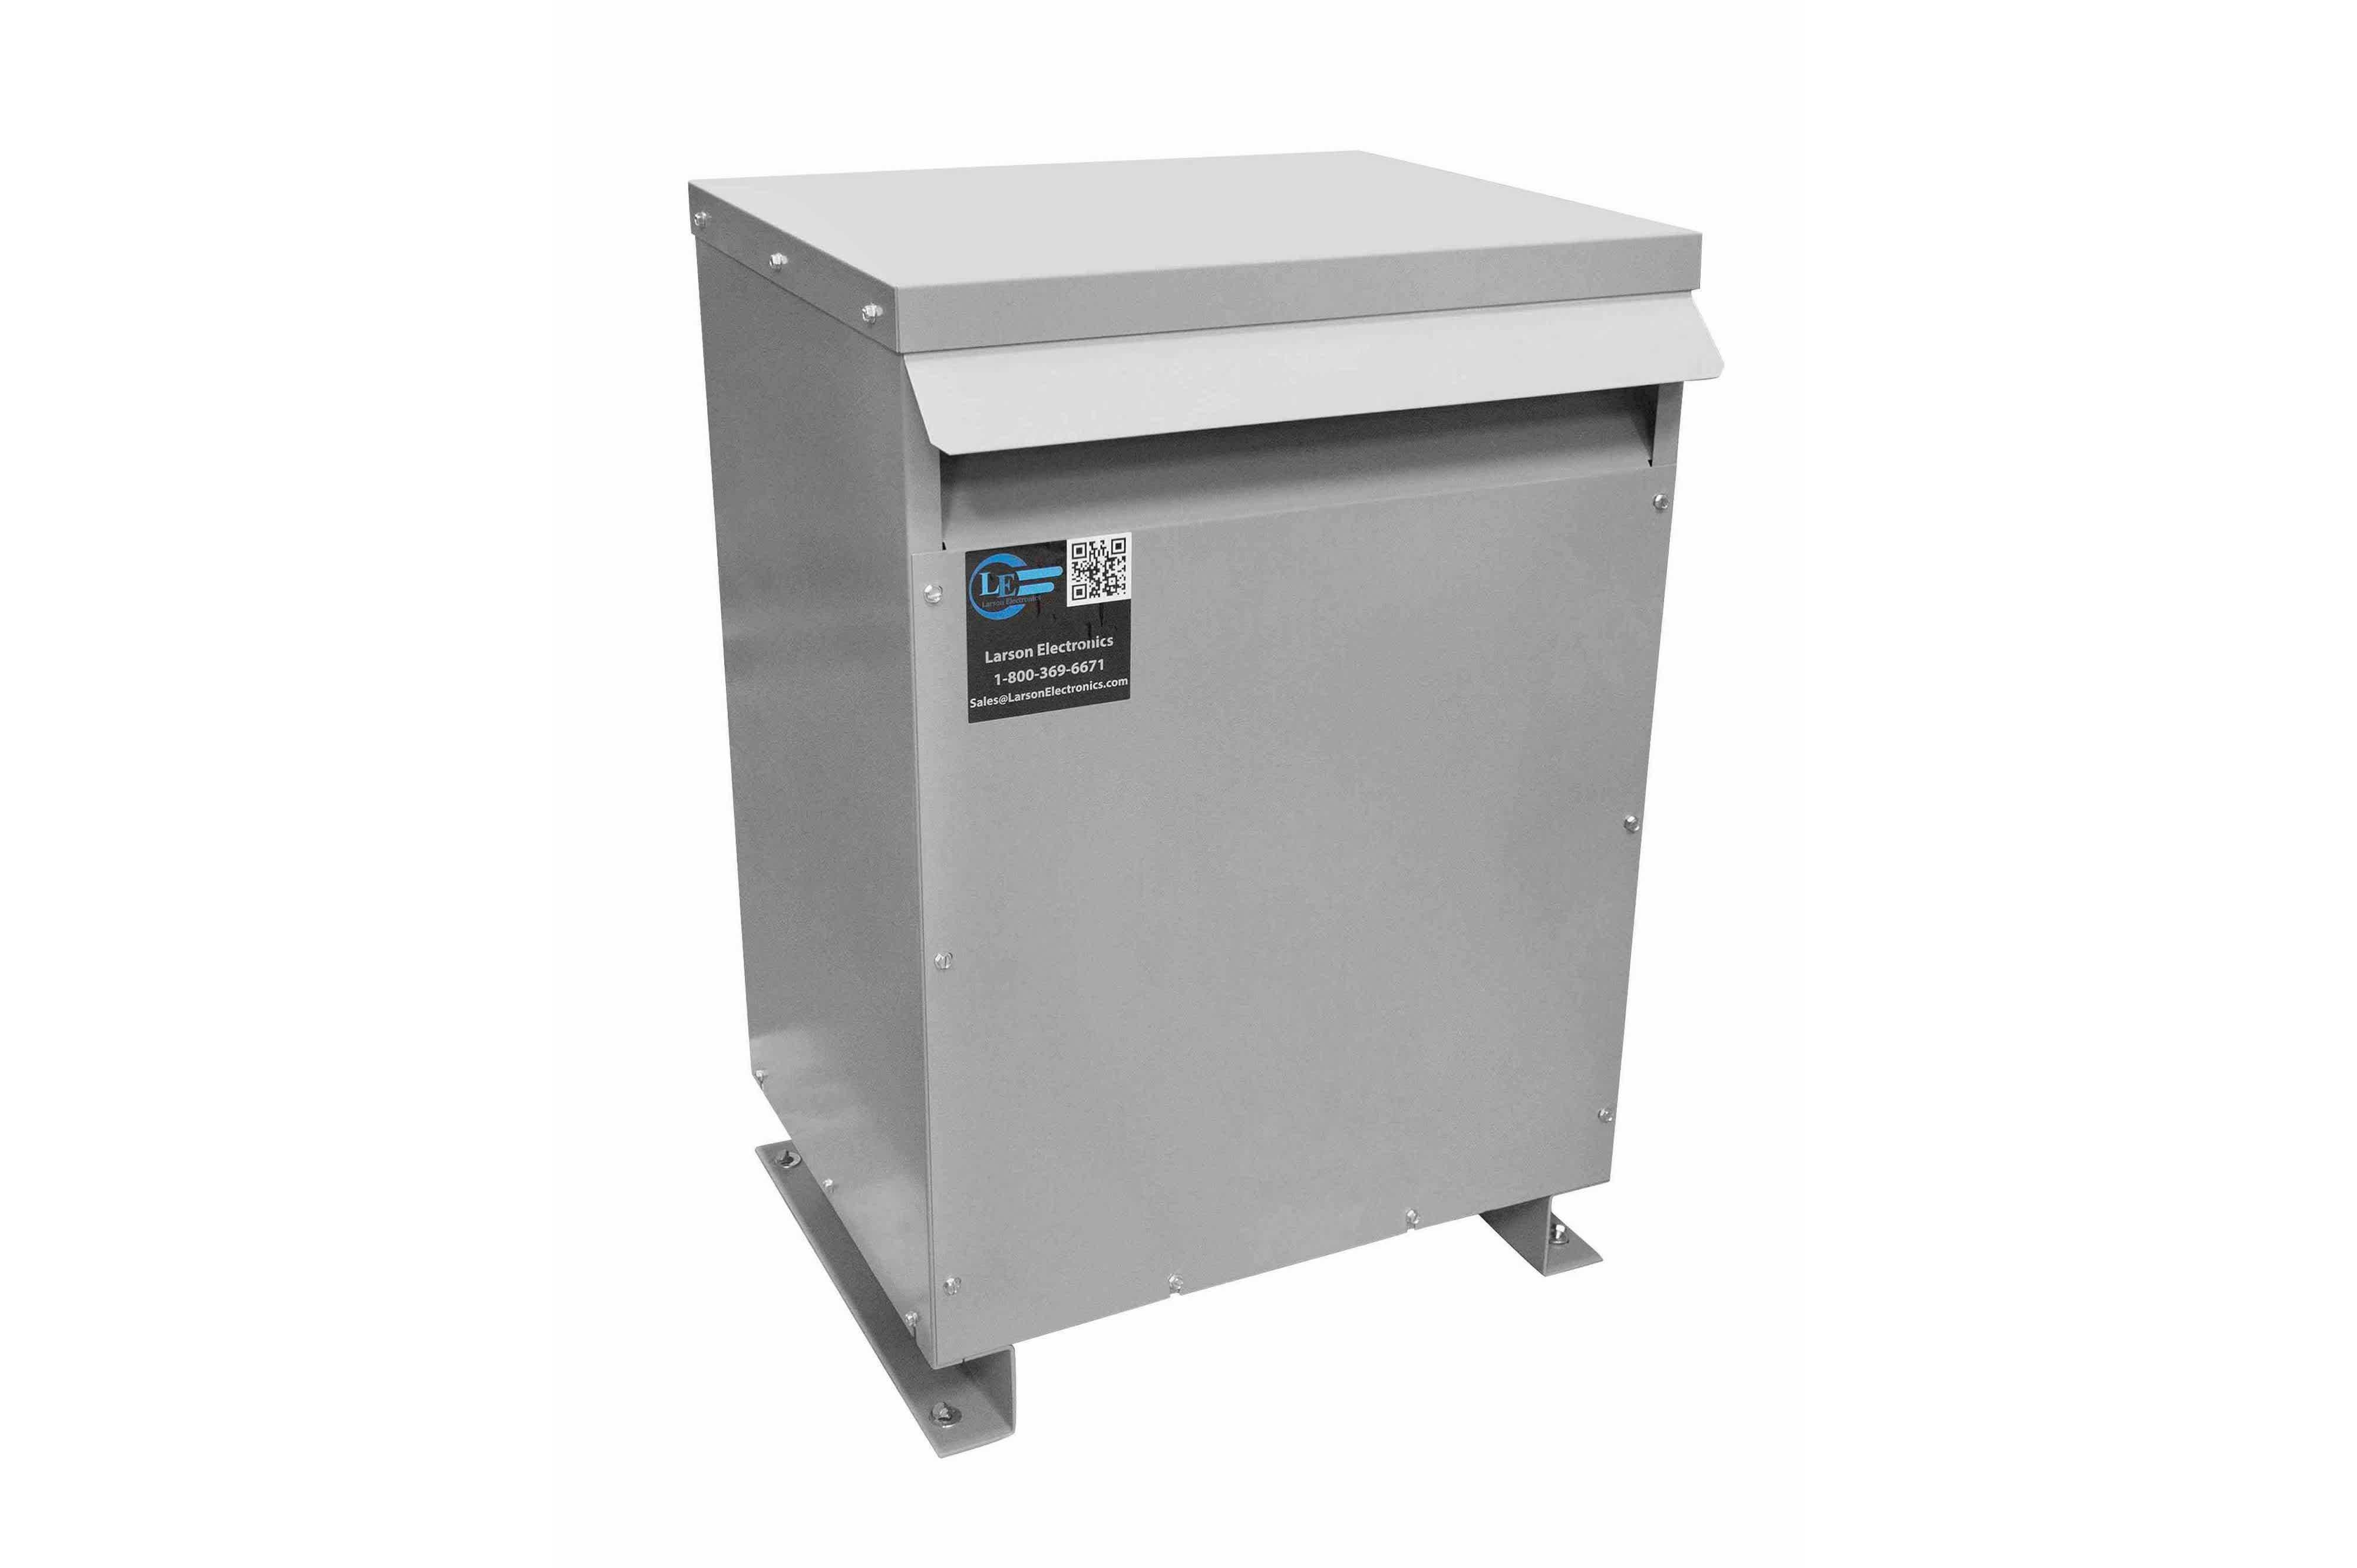 22.5 kVA 3PH Isolation Transformer, 600V Wye Primary, 460Y/266 Wye-N Secondary, N3R, Ventilated, 60 Hz